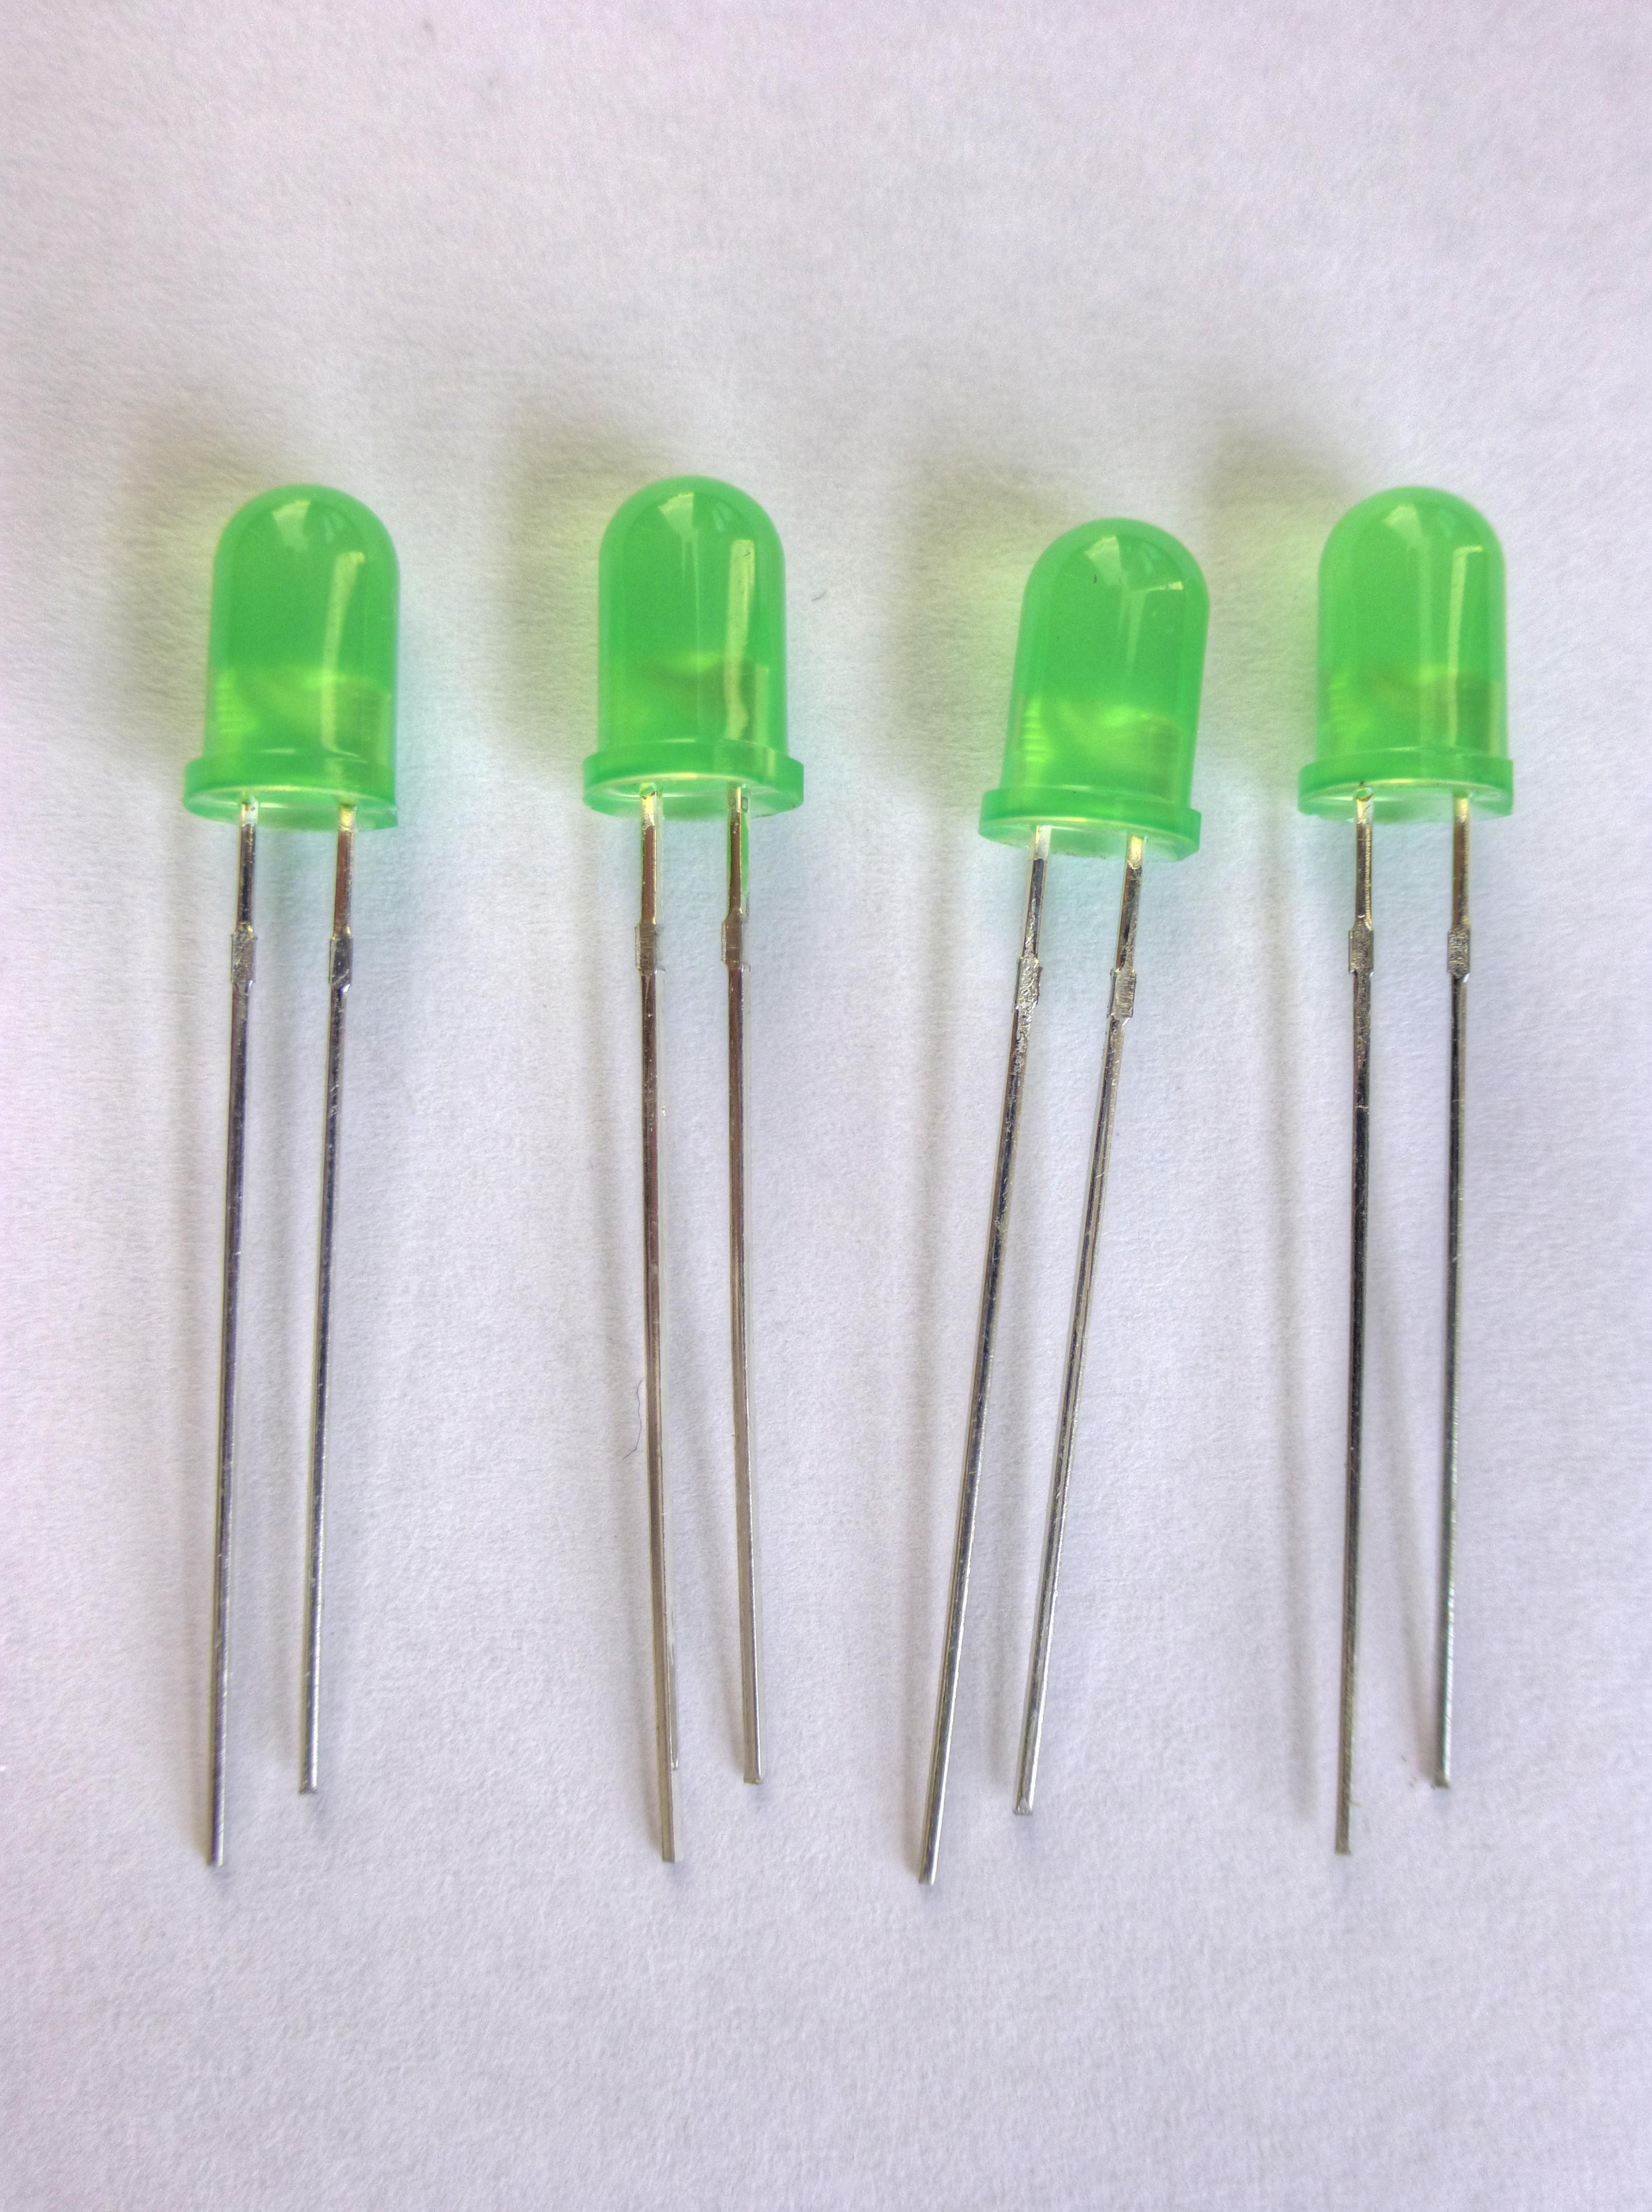 Light Emitting Diode : Light emitting diode wikipedia the free encyclopedia